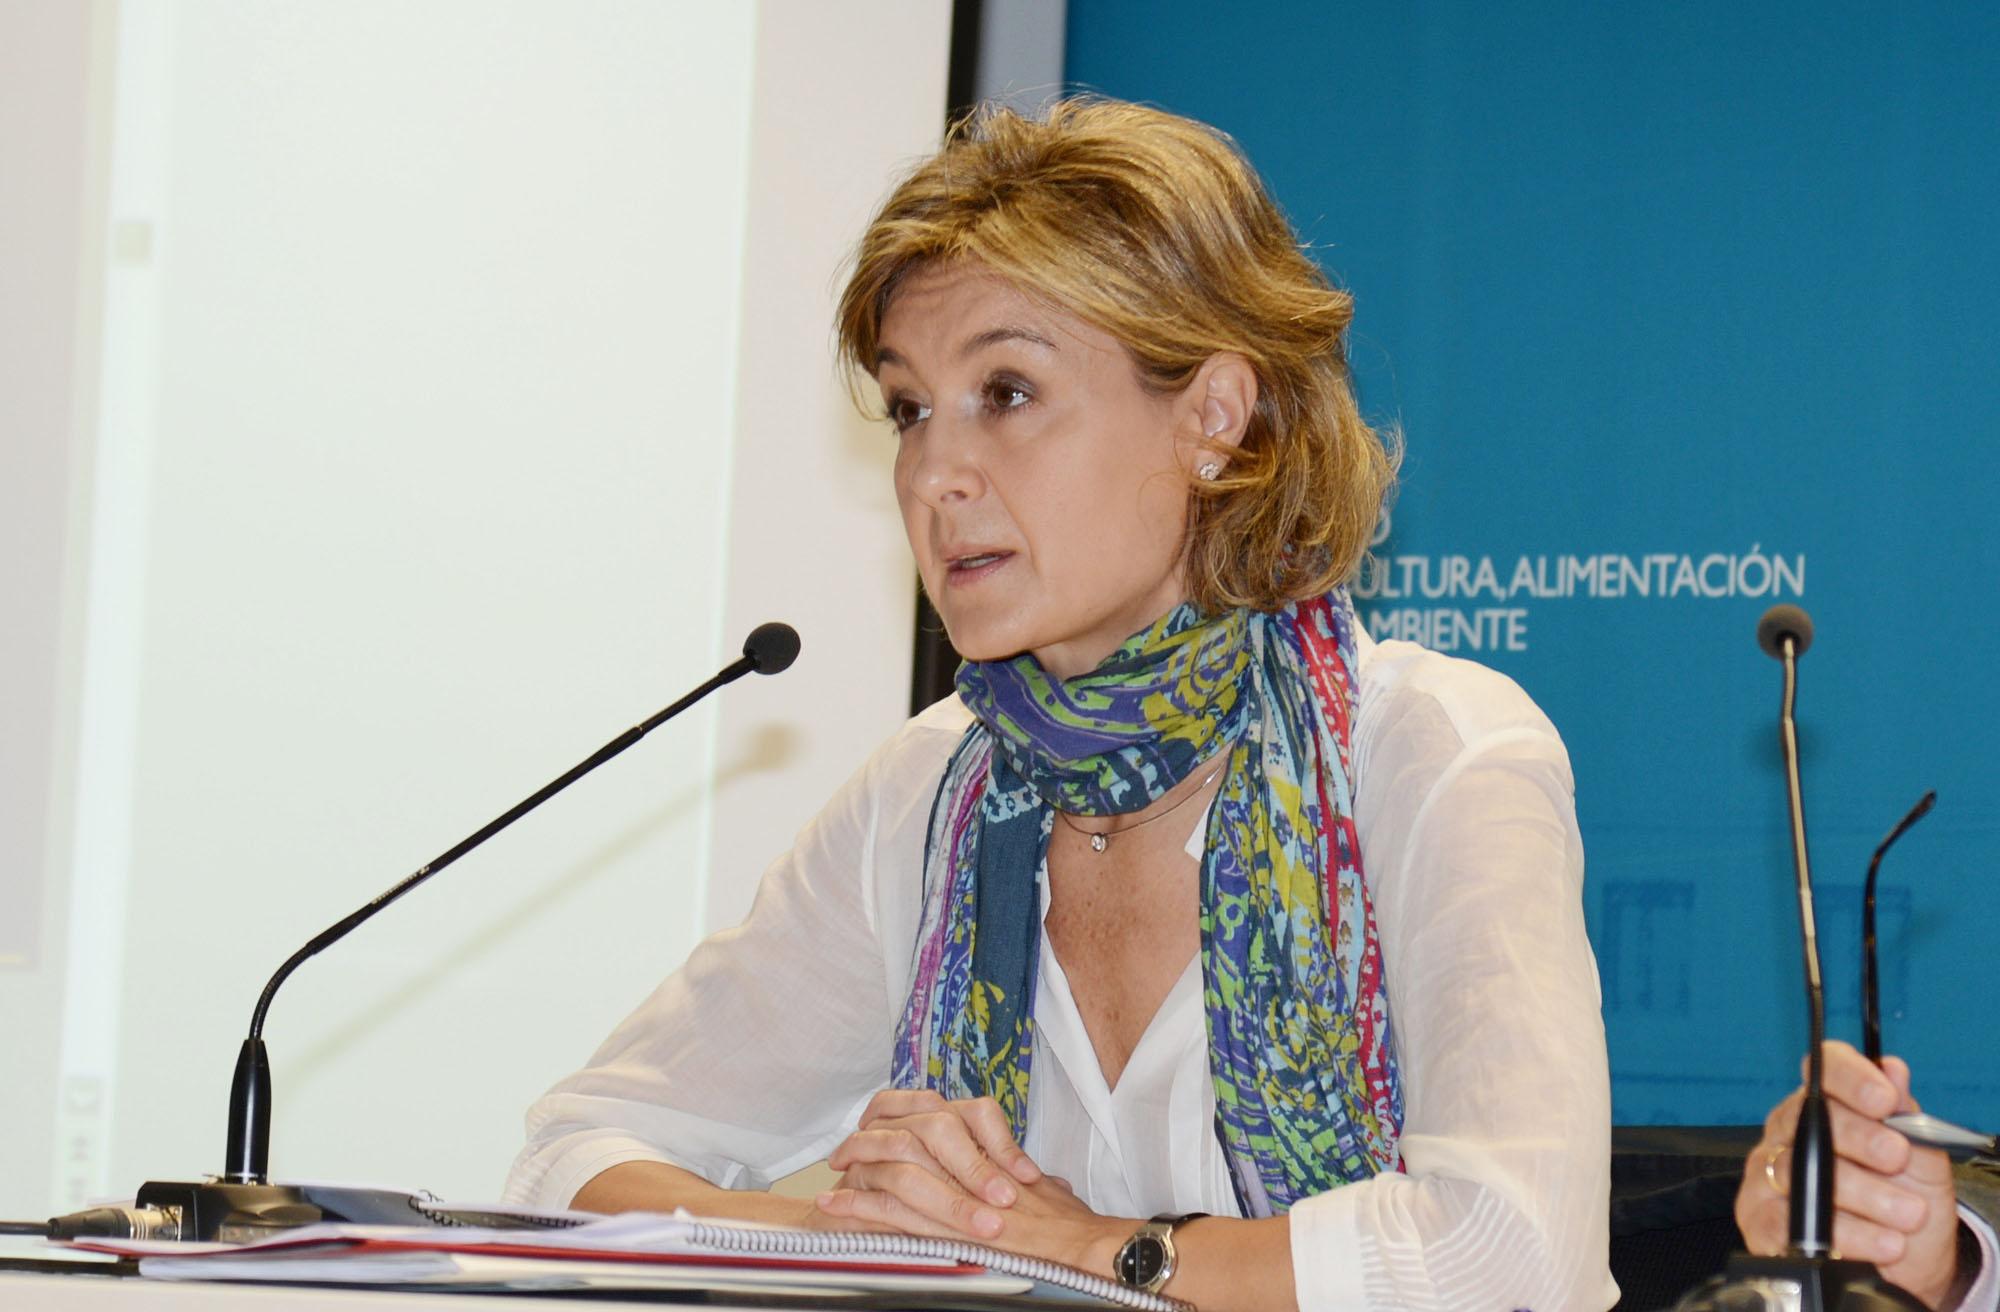 La ministra Isabel G. Tejerina